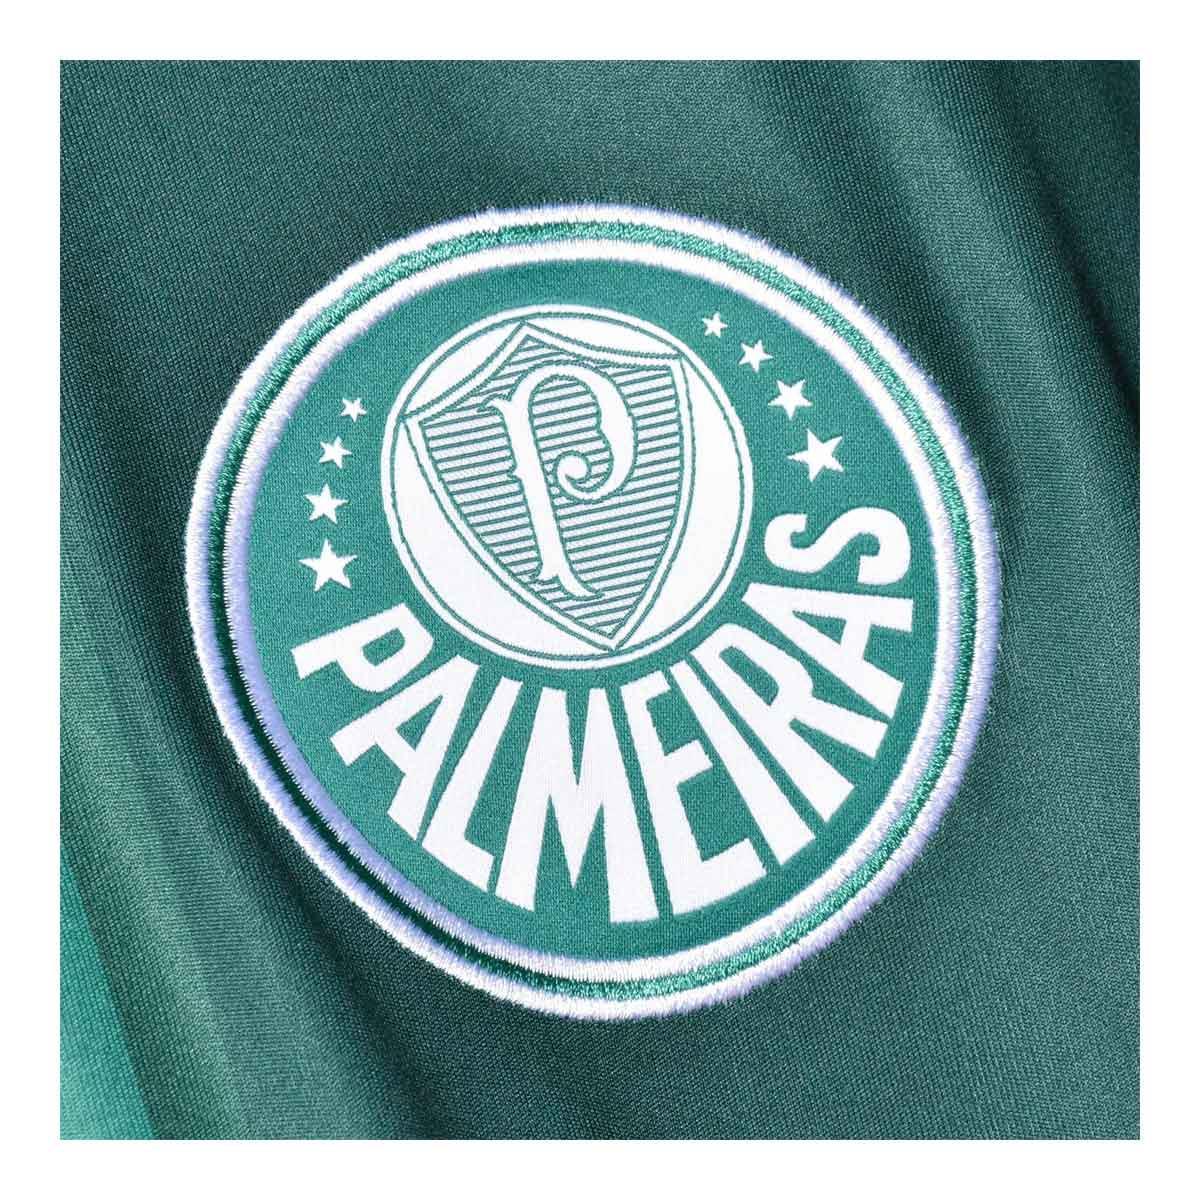 bff62069f Camisa Adidas Palmeiras I 2016 Torcedor Masculino